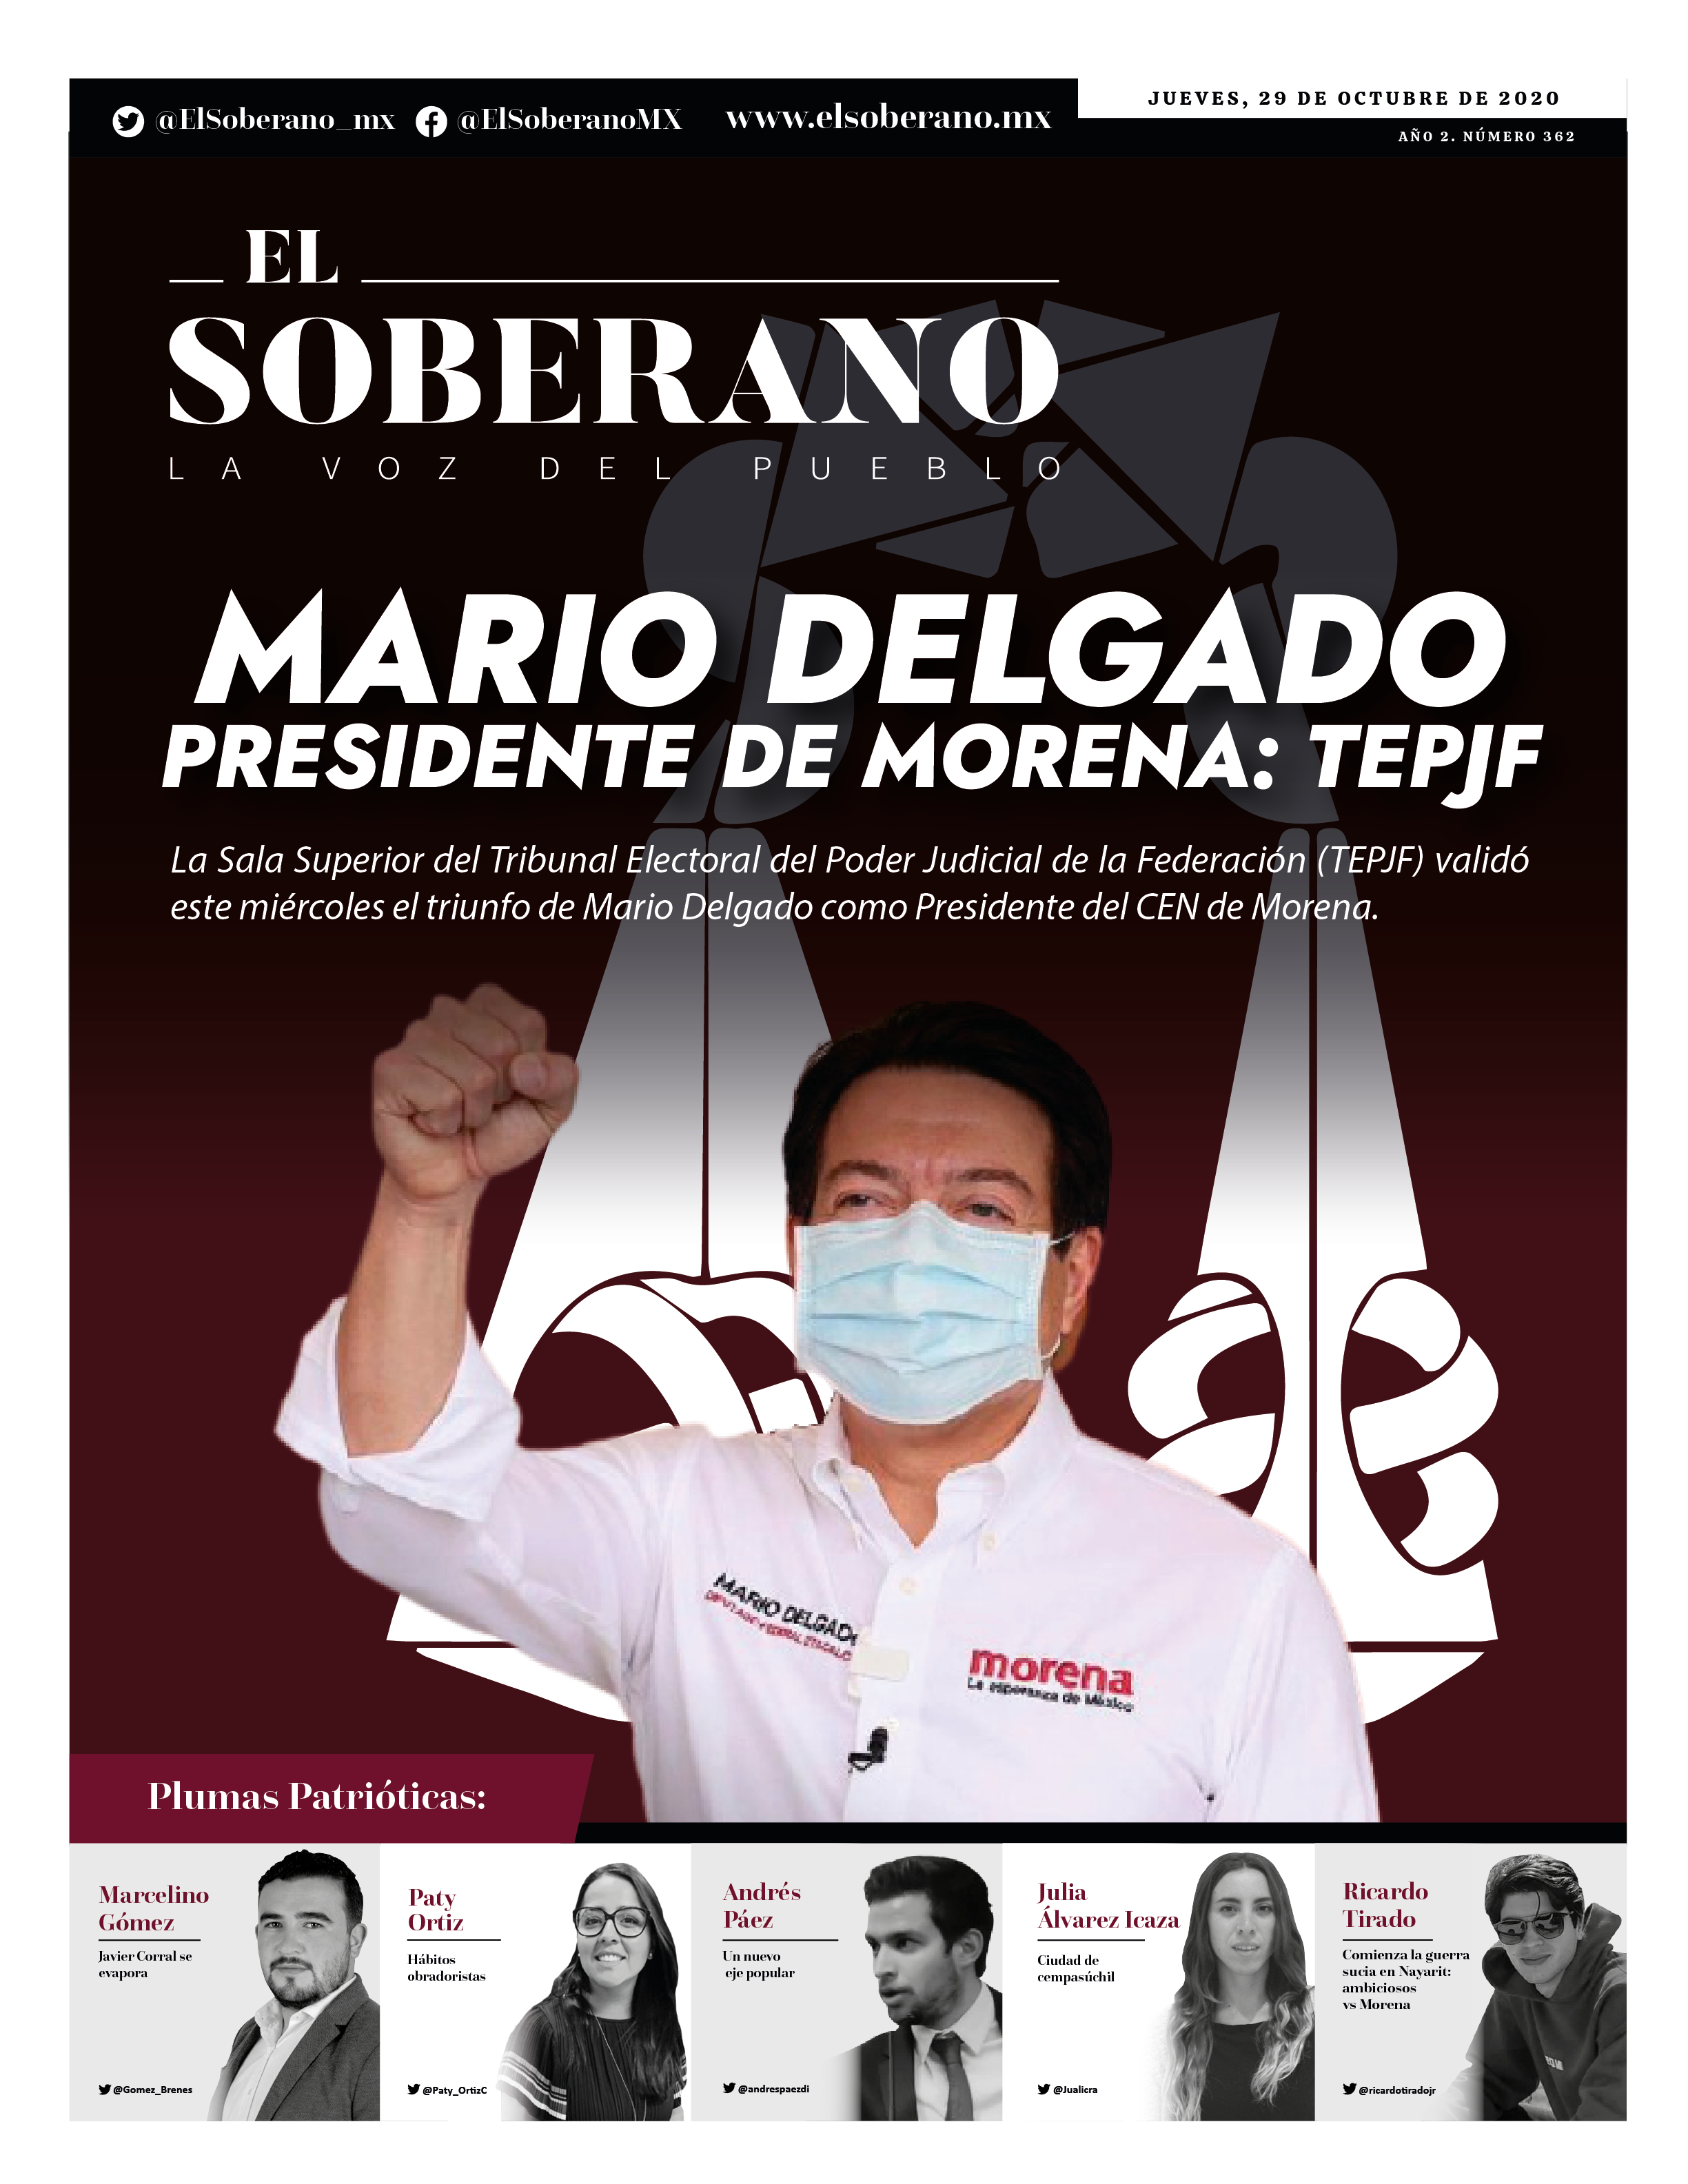 Mario Delgado, Presidente de Morena: TEPJF